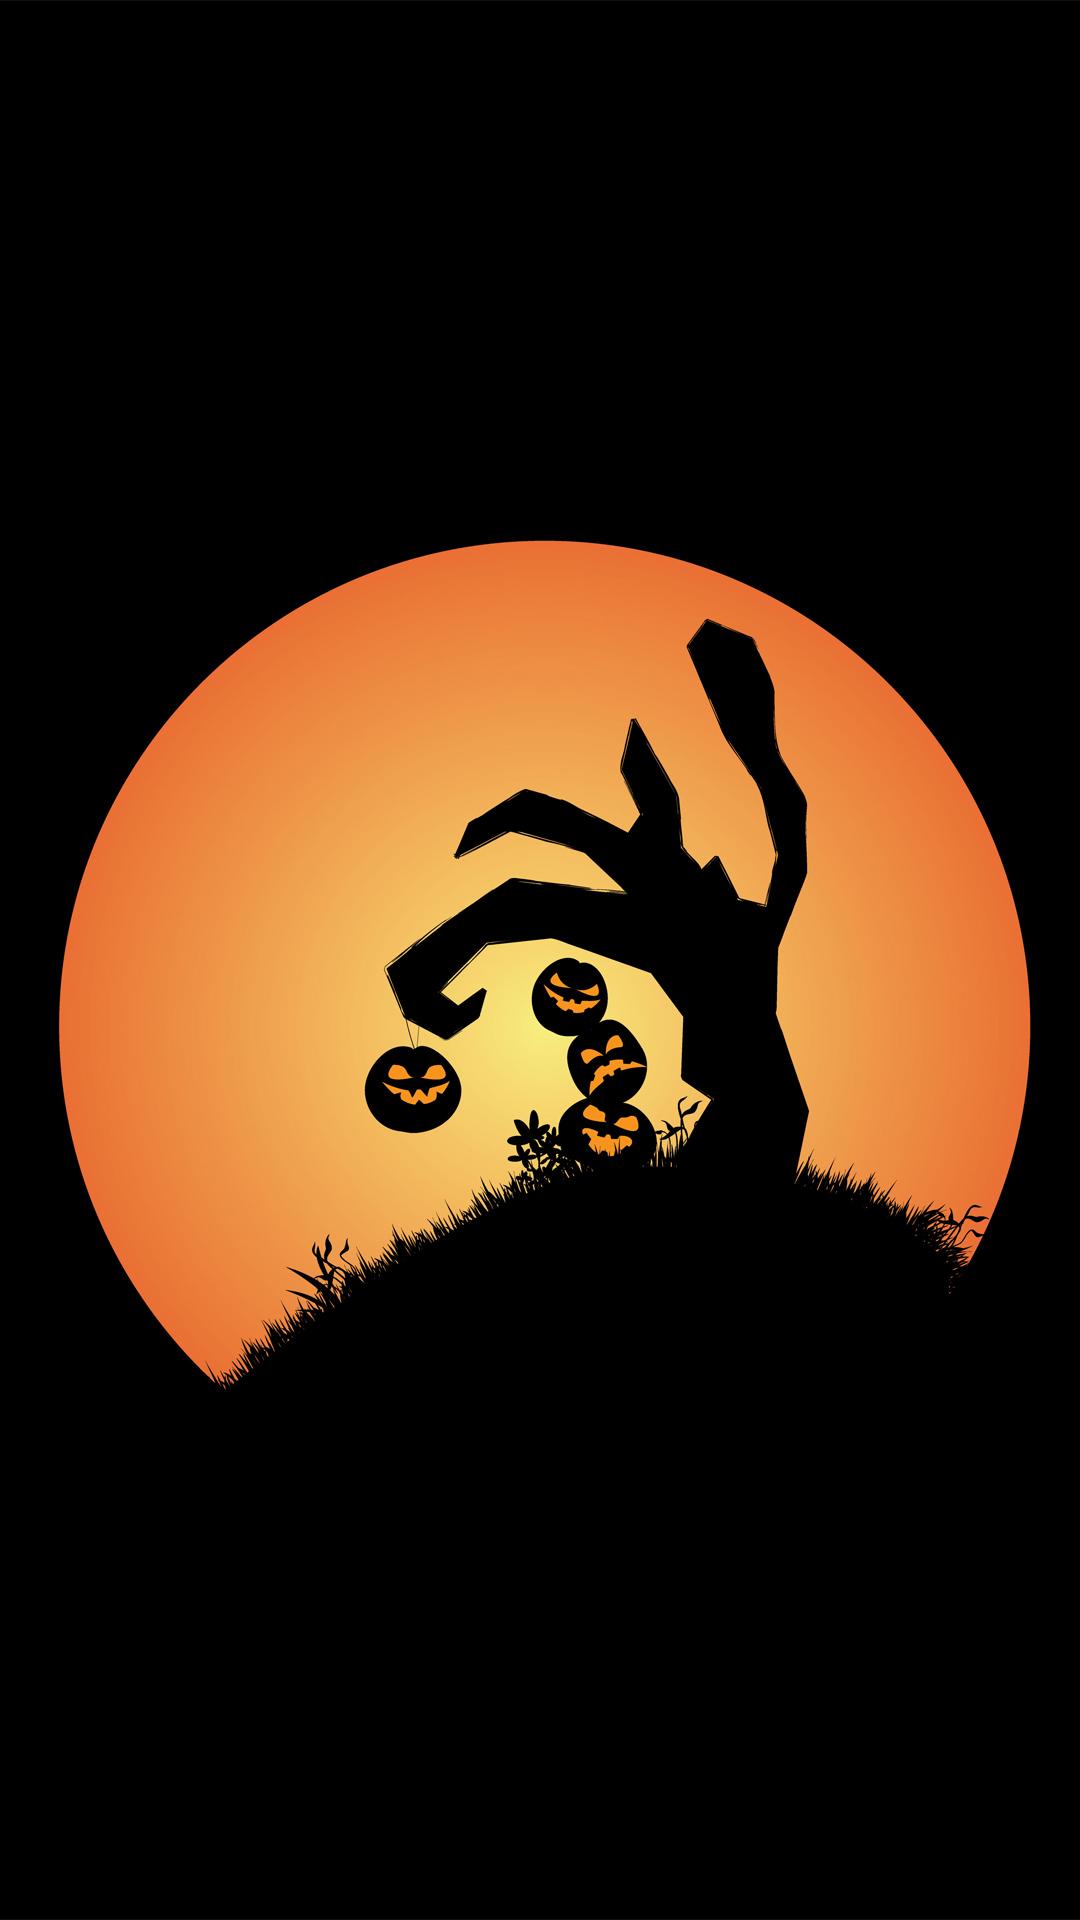 Halloween tree pumpkin